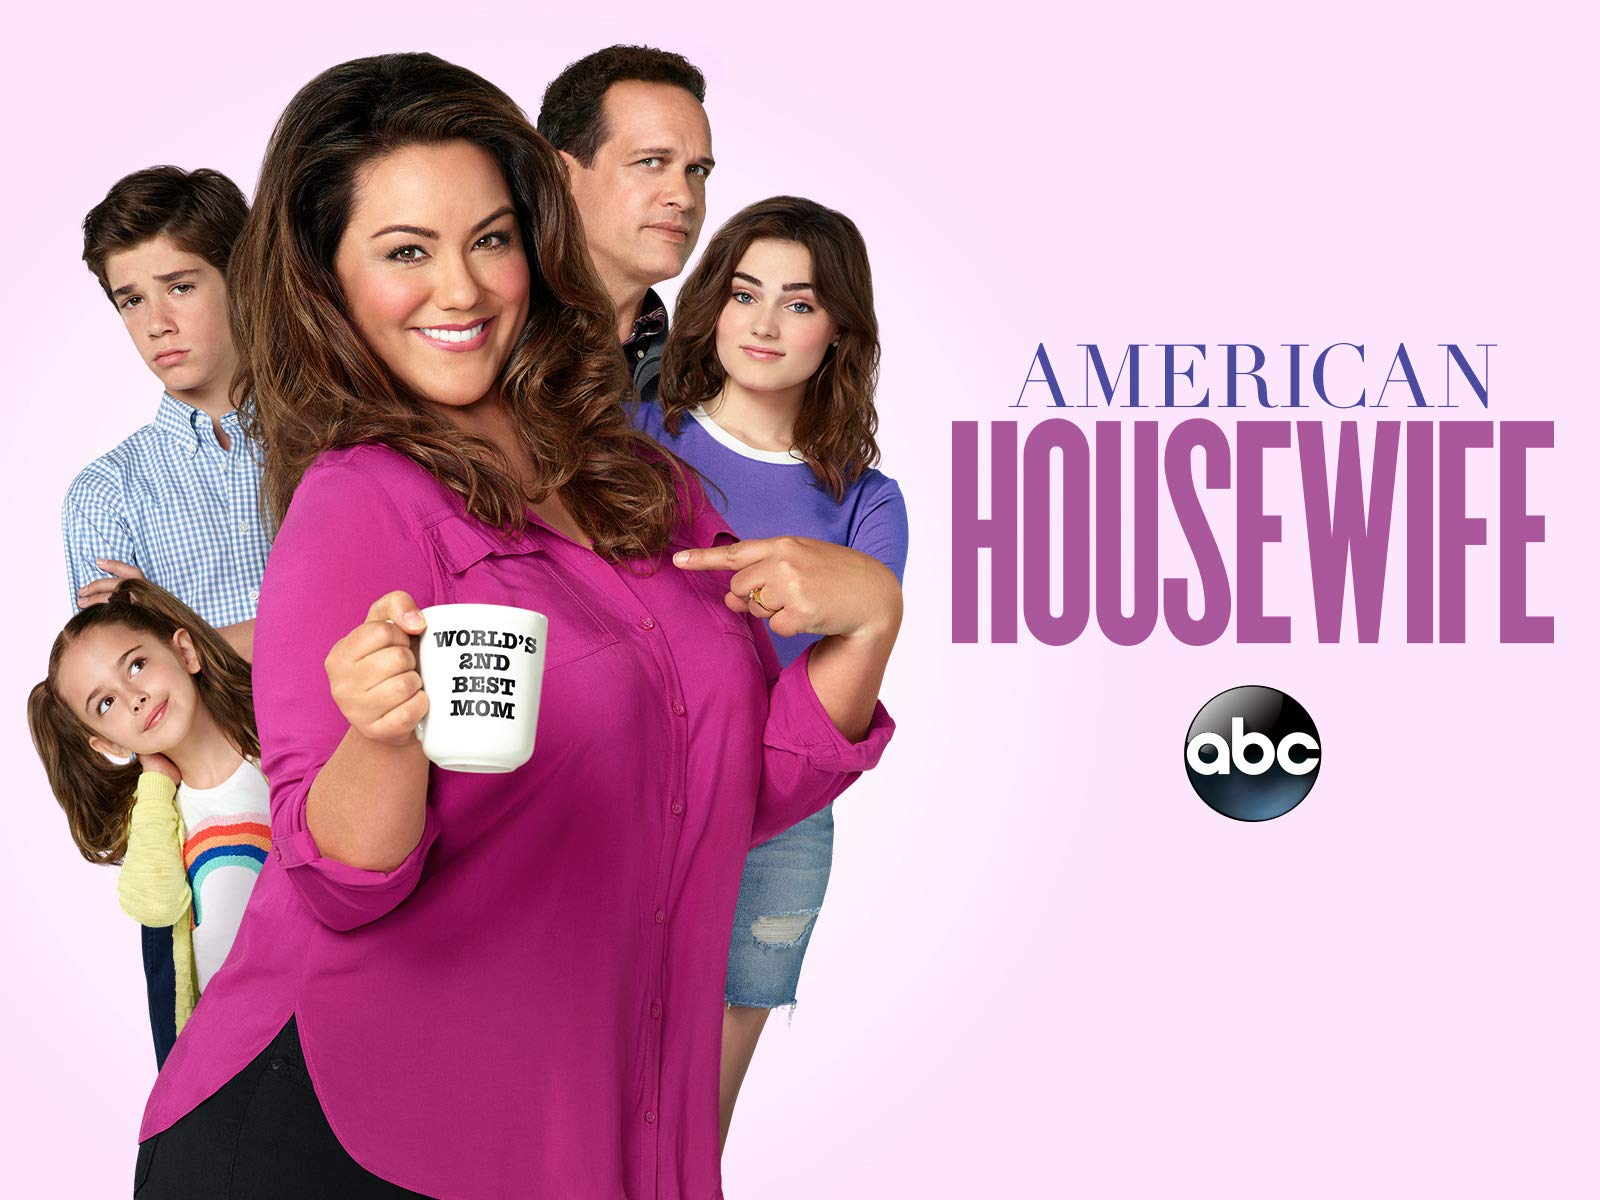 American Housewife - Season 3